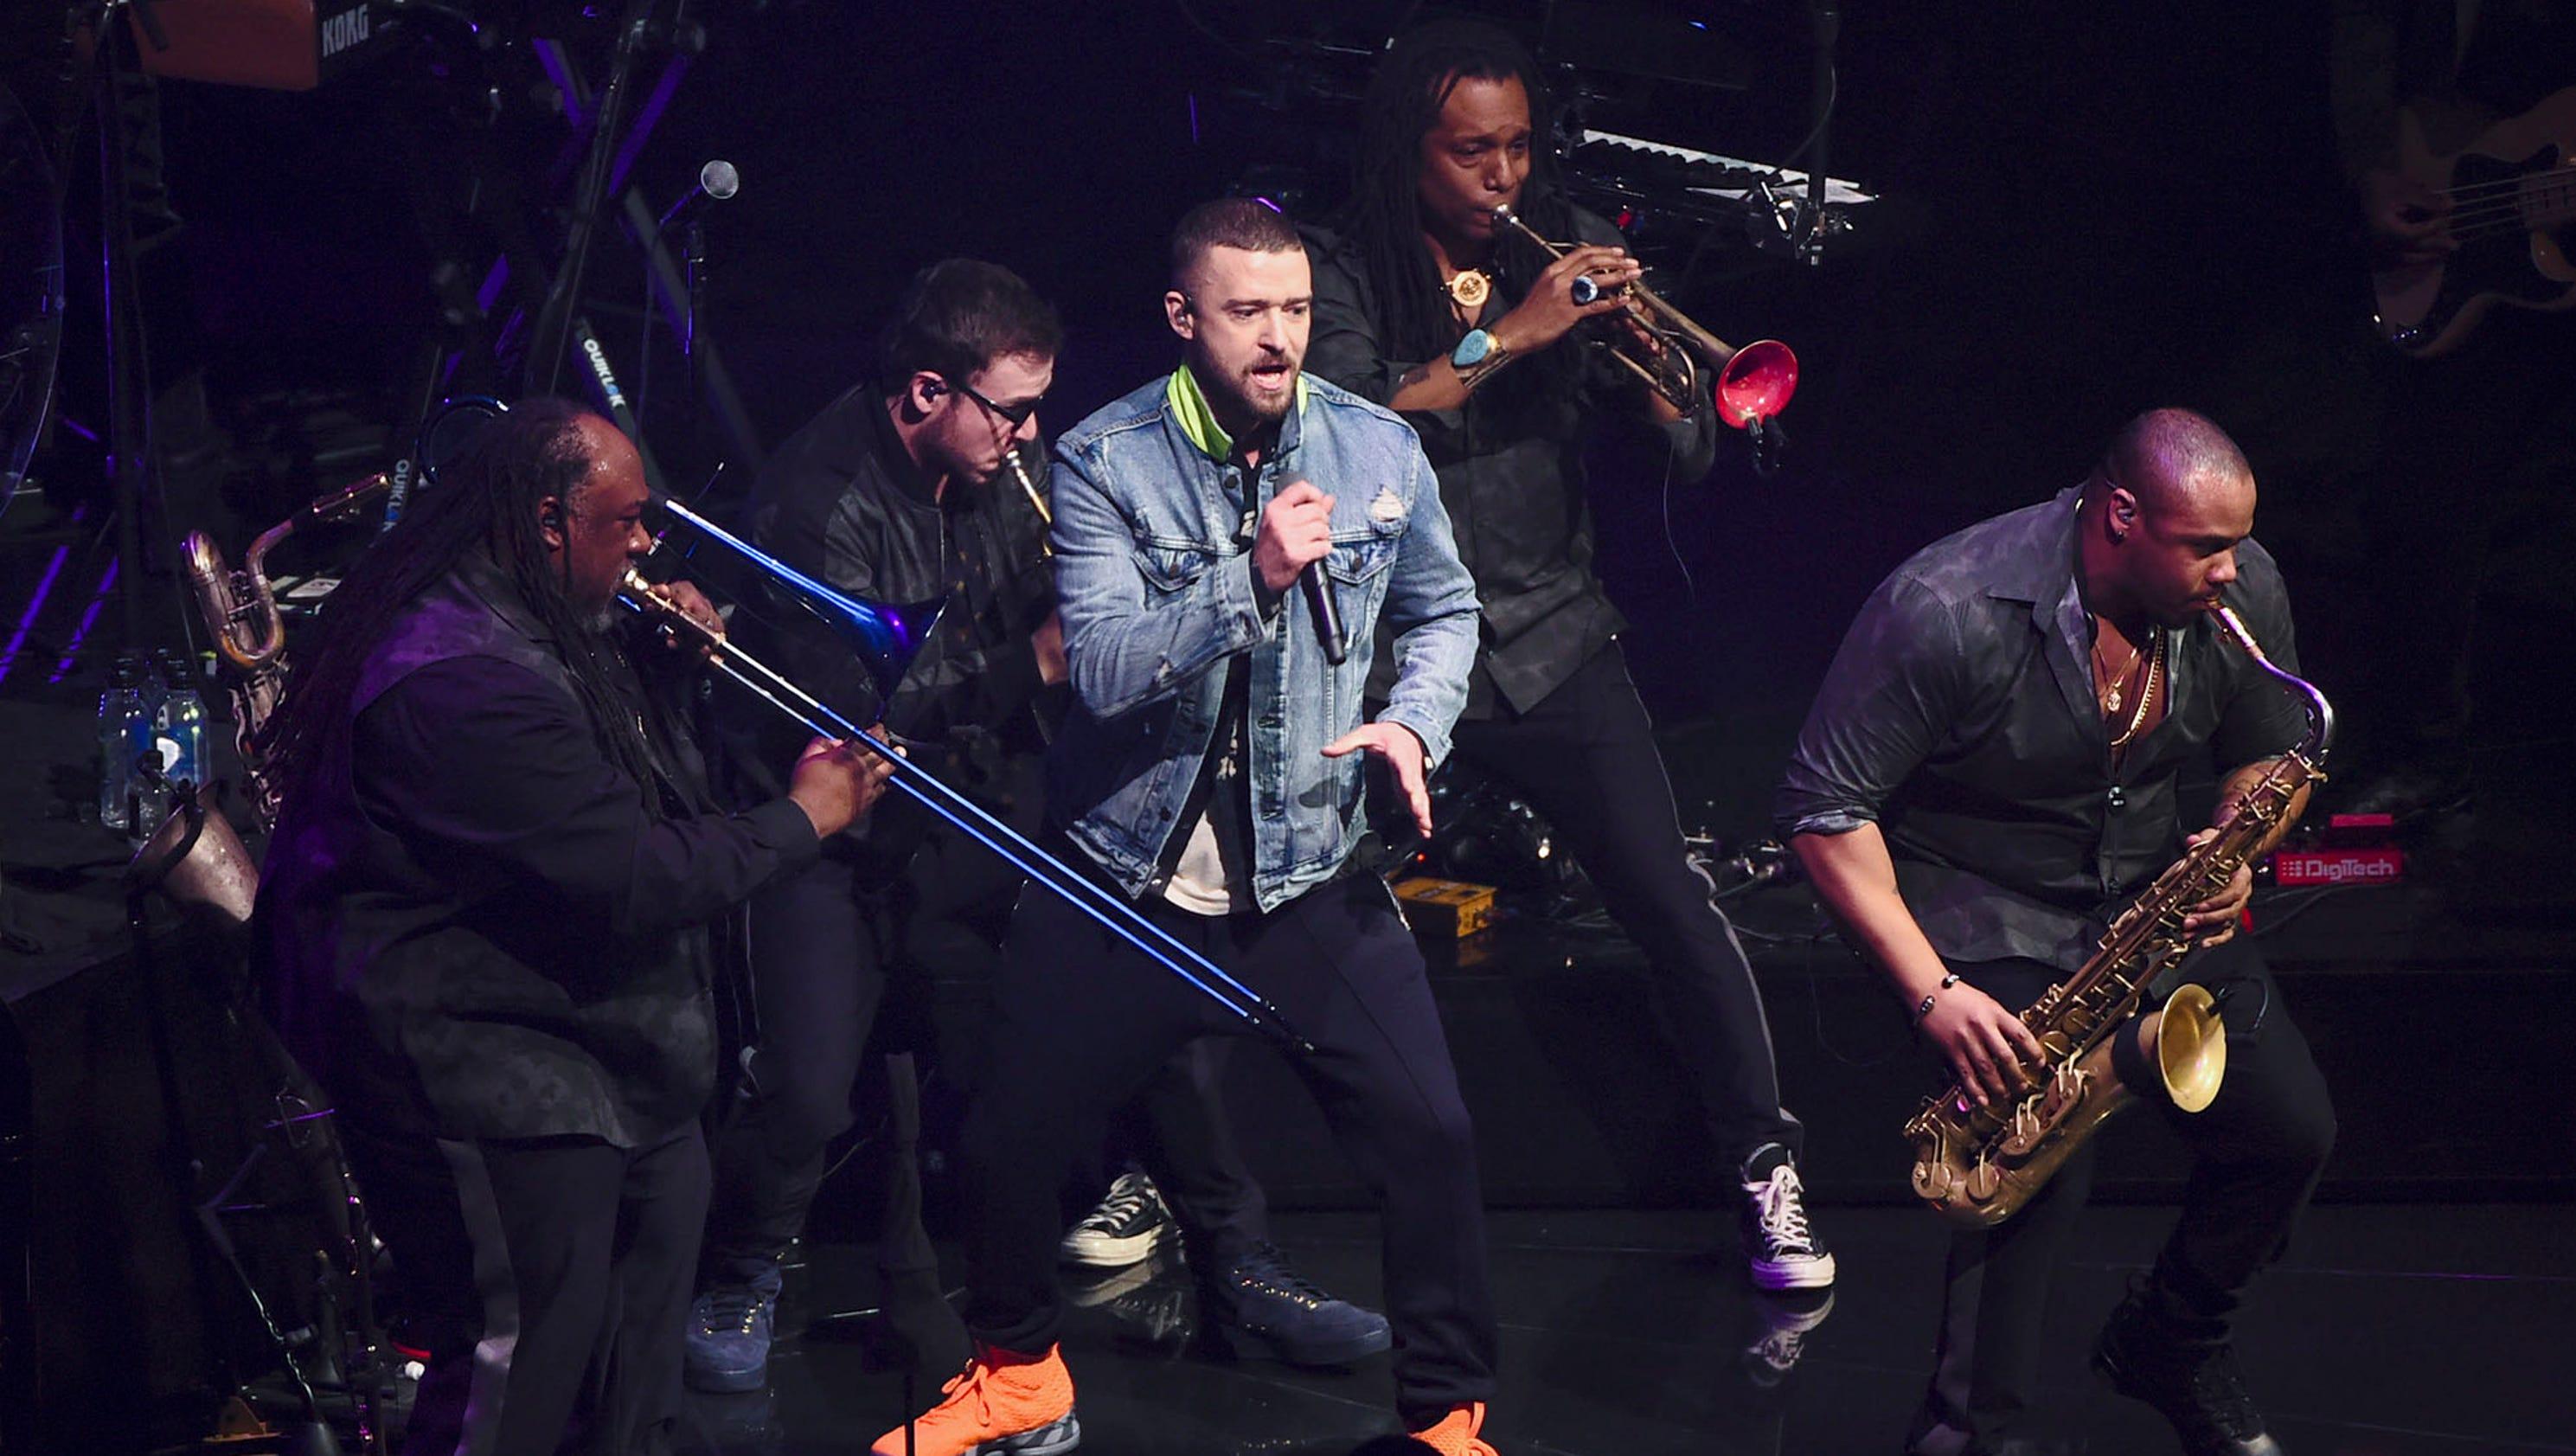 Justin Timberlake Tour Jt Wows At Madison Square Garden Show